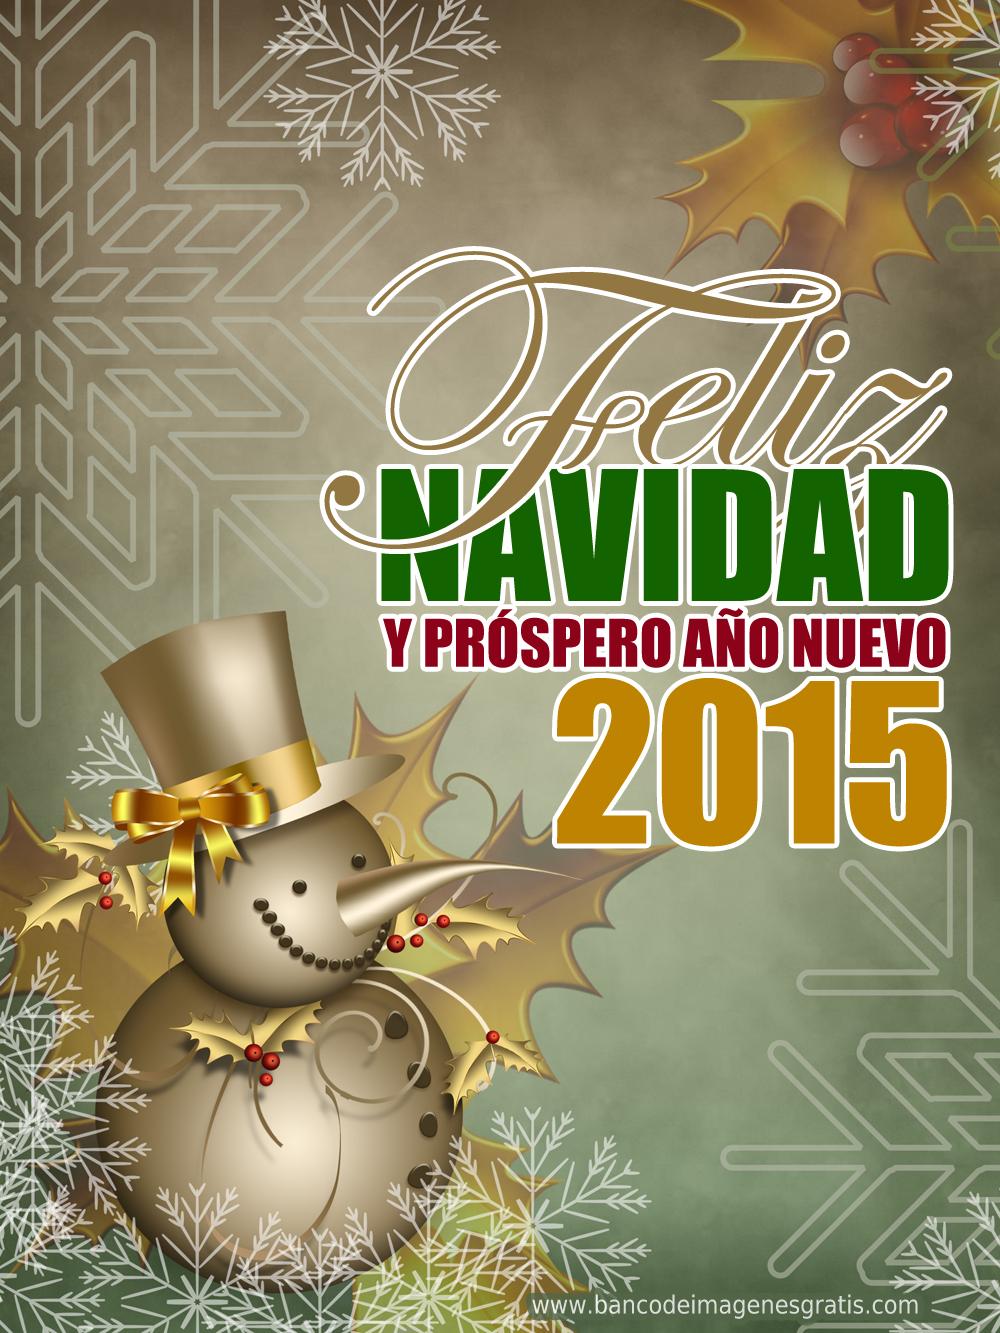 Merry christmas navidad 2015 on pinterest happy new - Tarjetas de navidad artesanales ...